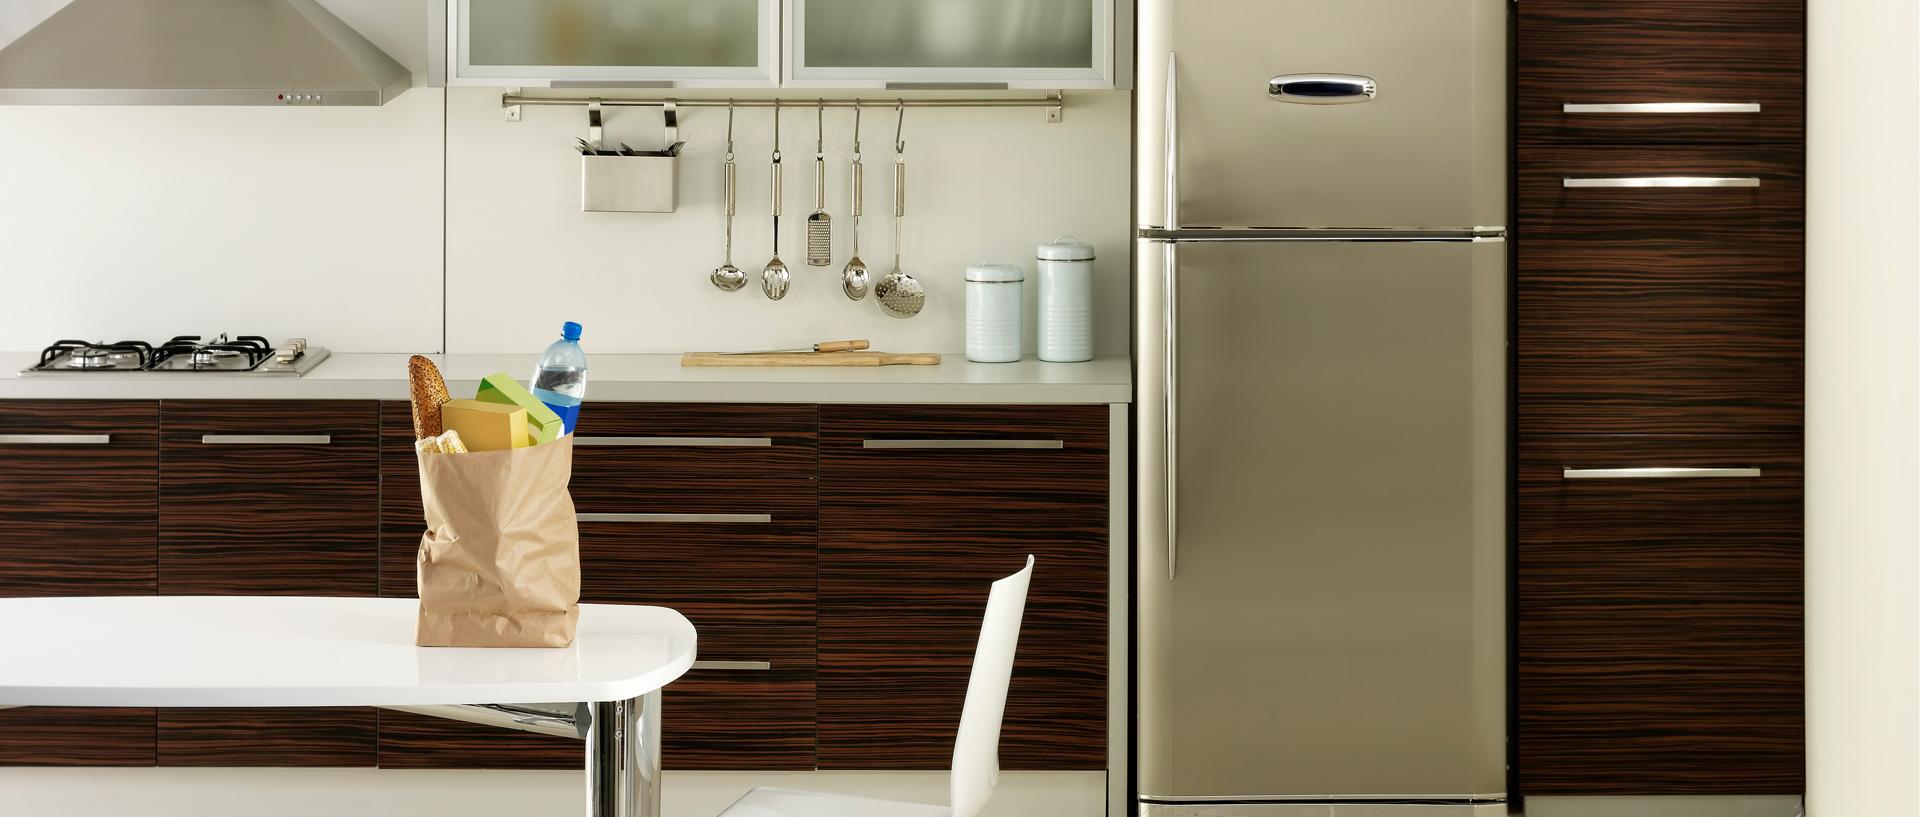 Top freezer refrigerators still the sensible choice consumer reports rubansaba